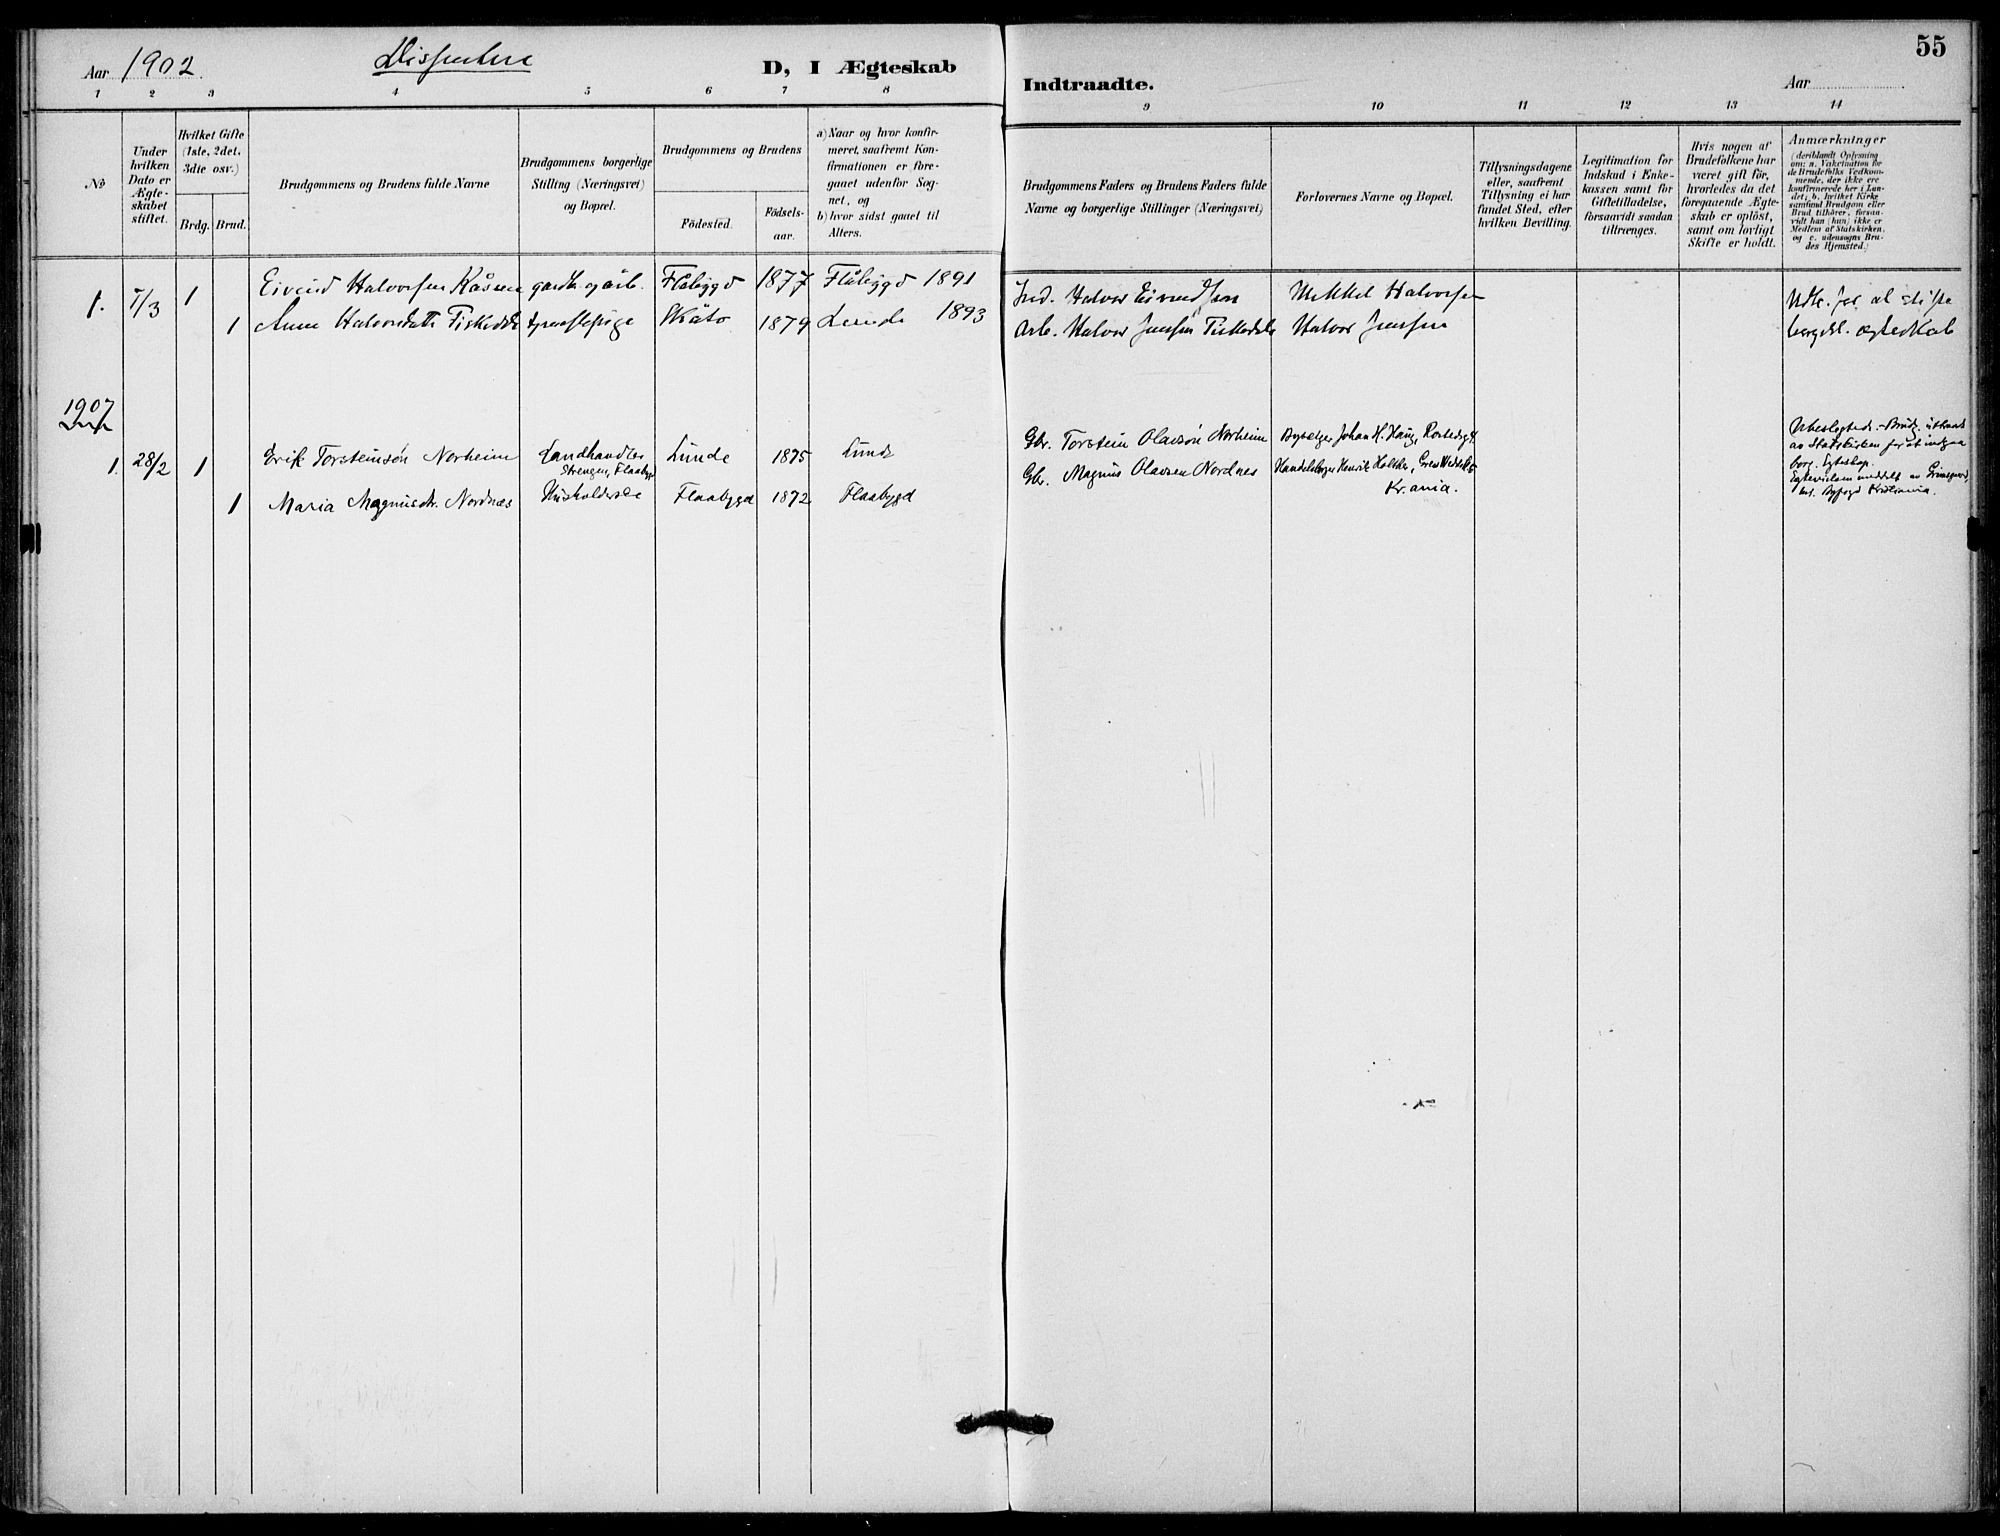 SAKO, Lunde kirkebøker, F/Fb/L0004: Ministerialbok nr. II 4, 1892-1907, s. 55